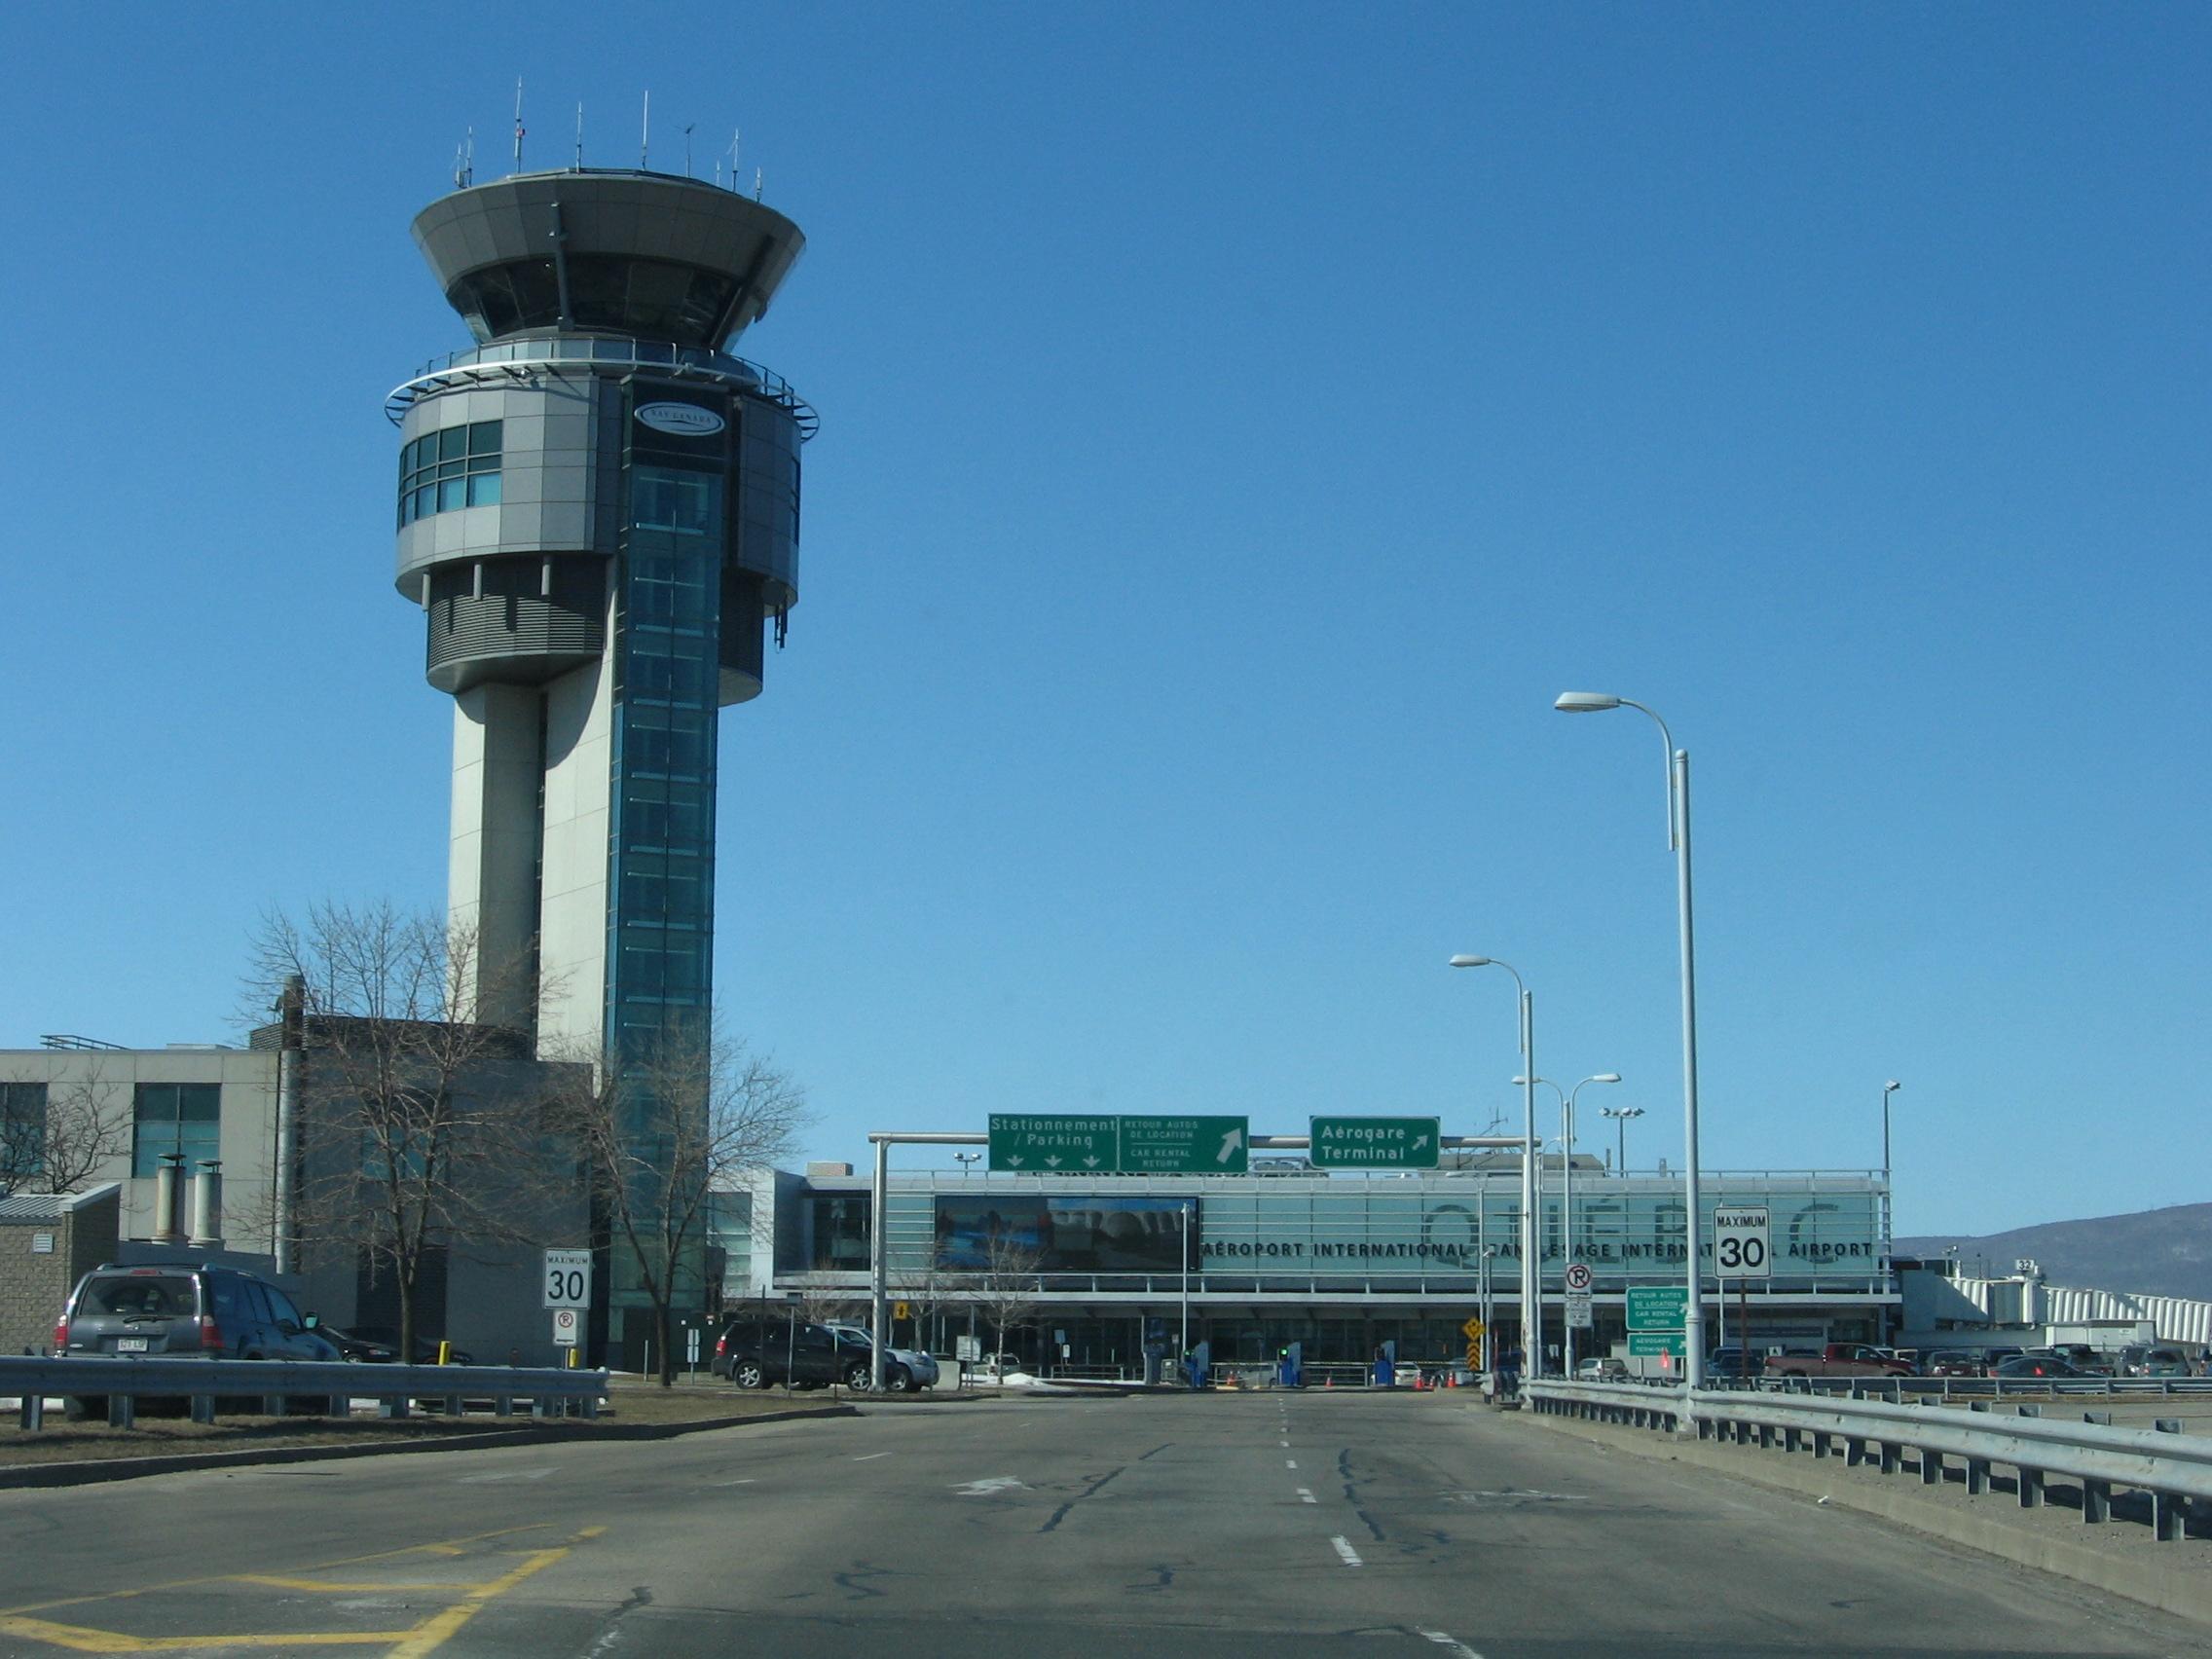 Hotel Montreal Aeroport Trudeau